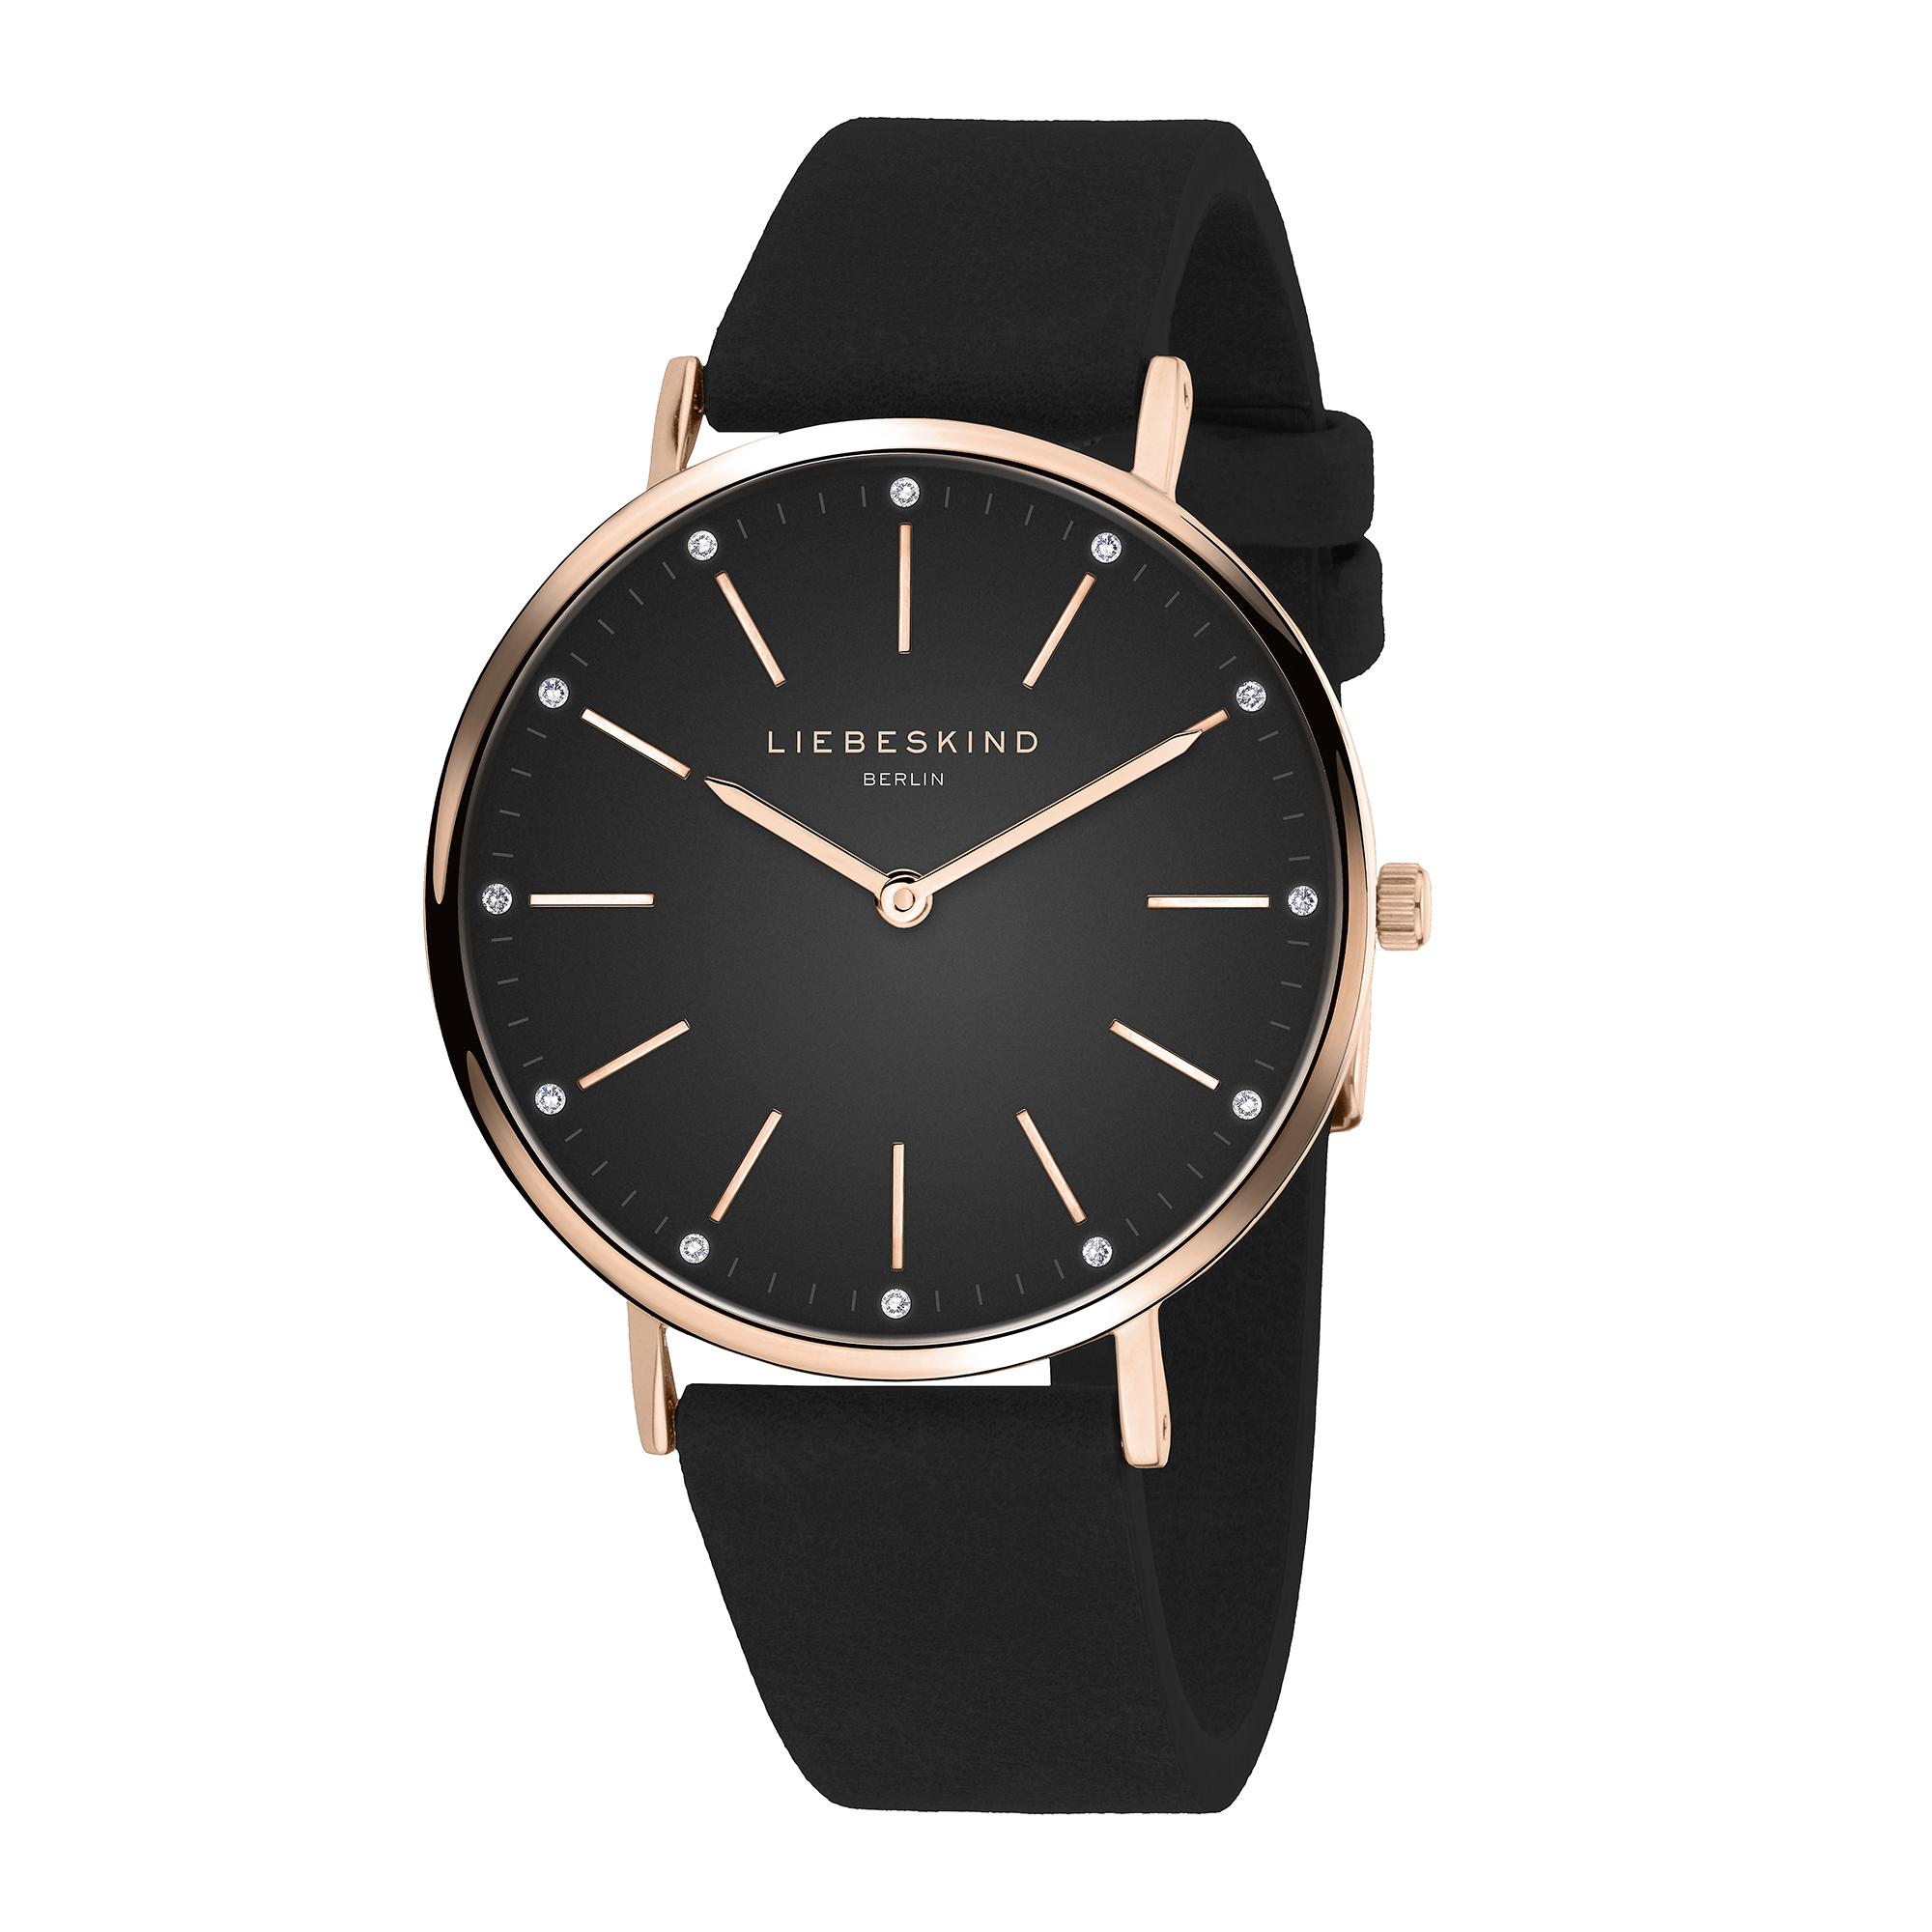 LIEBESKIND BERLIN Damen Uhr Armbanduhr Leder LT-0012-LQ